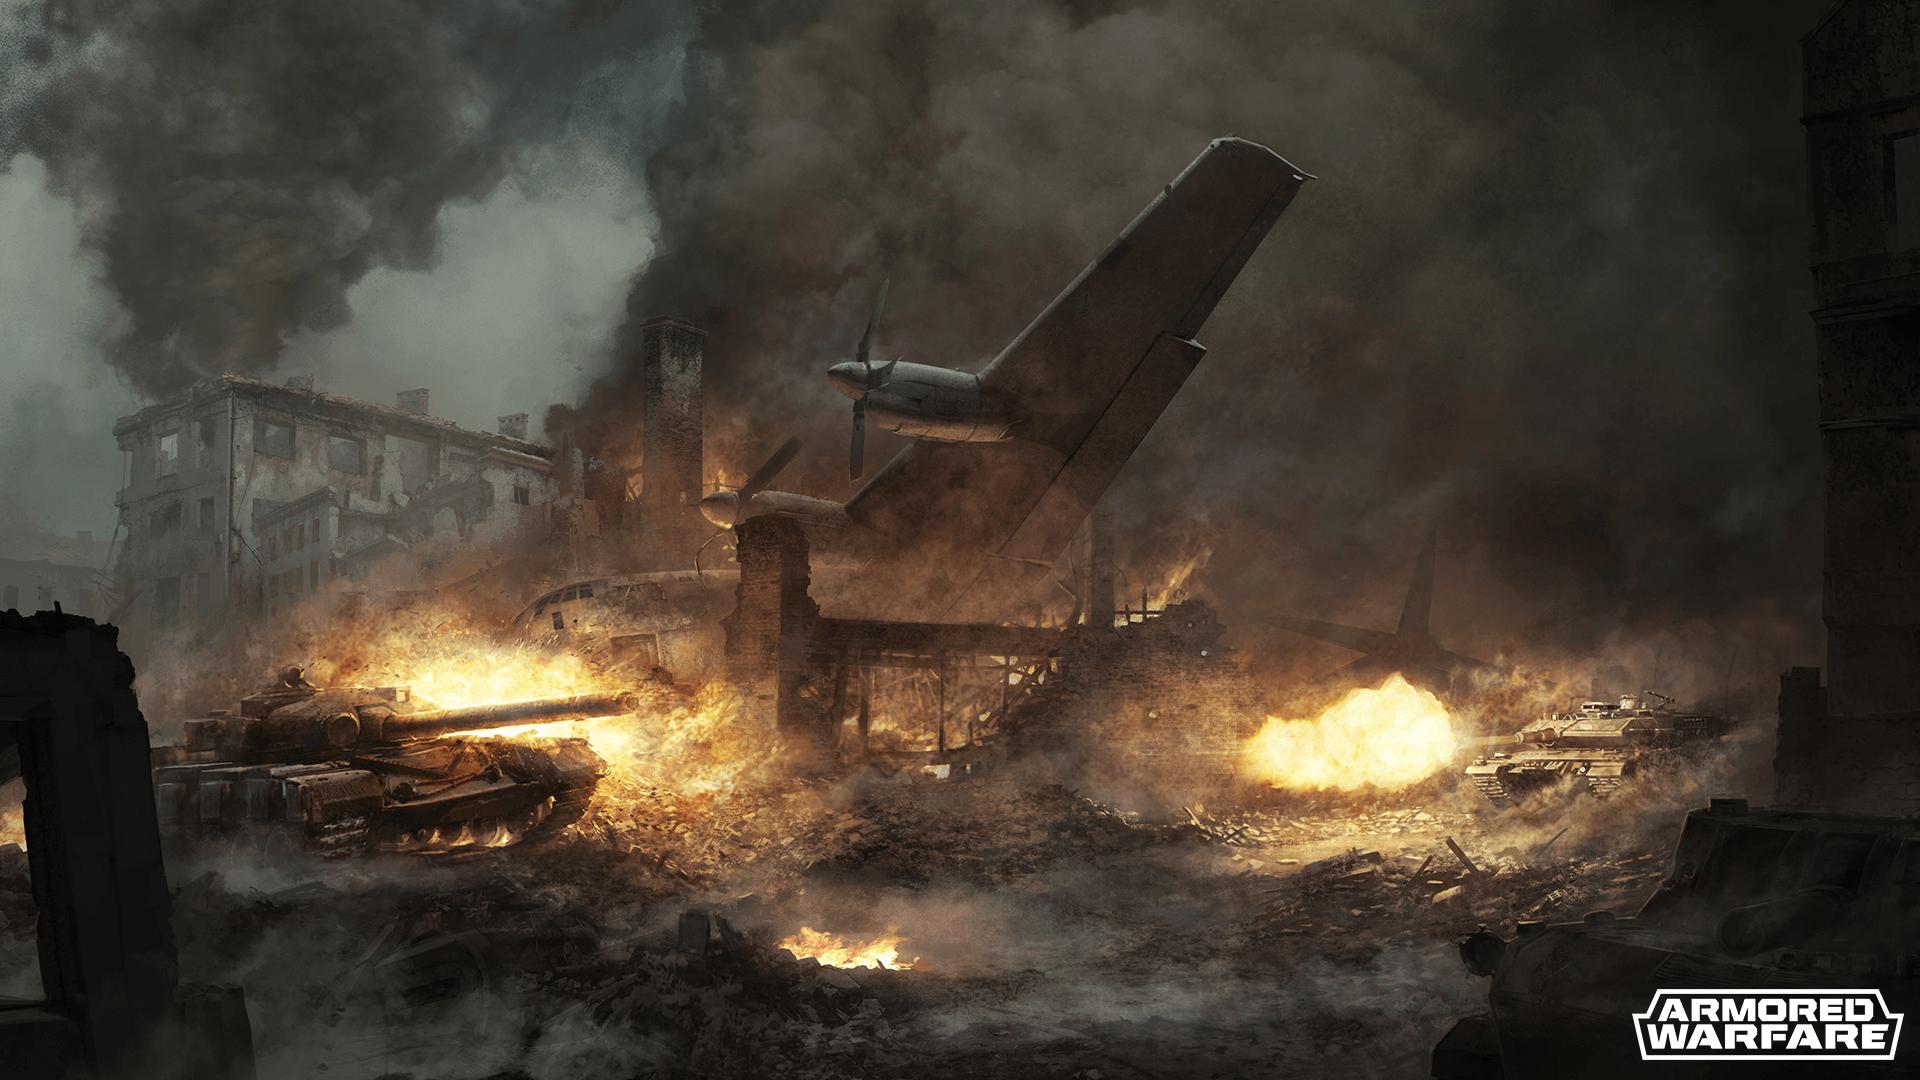 Armored Warfare World on Fire Backstory Teased news header